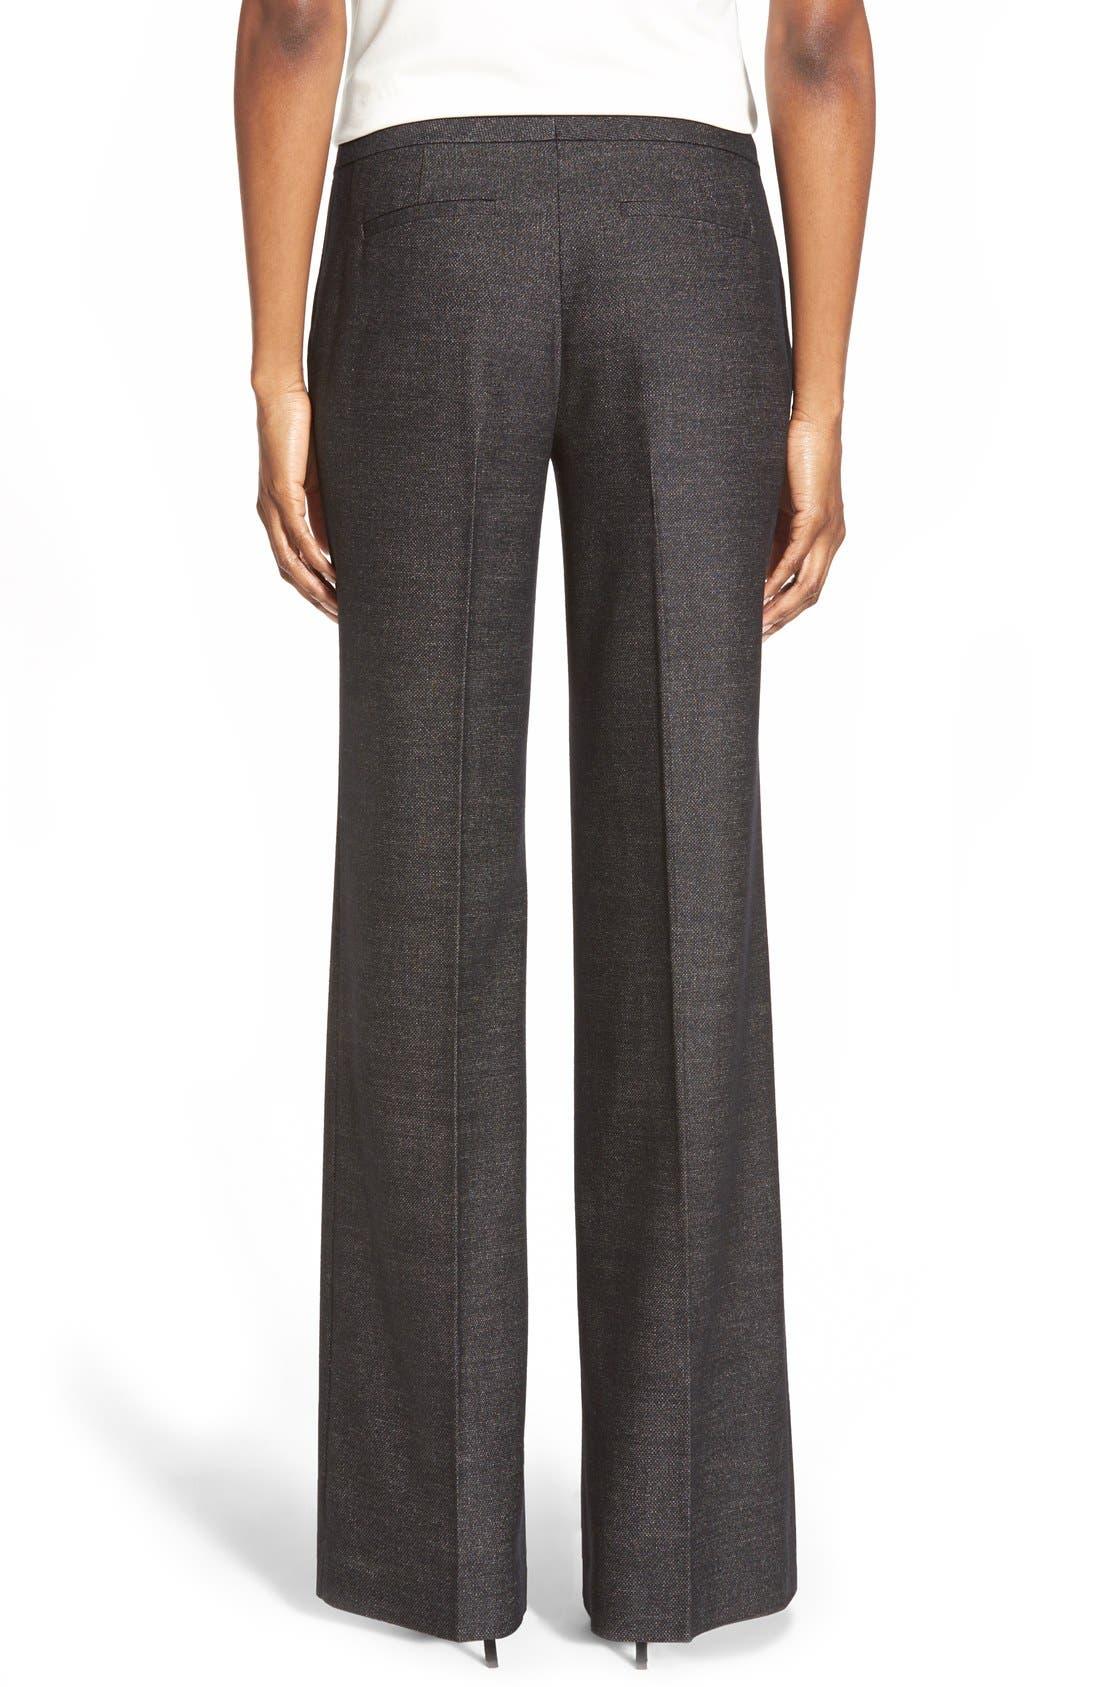 Alternate Image 2  - Classiques Entier® 'Verona' Suiting Trousers (Regular & Petite)